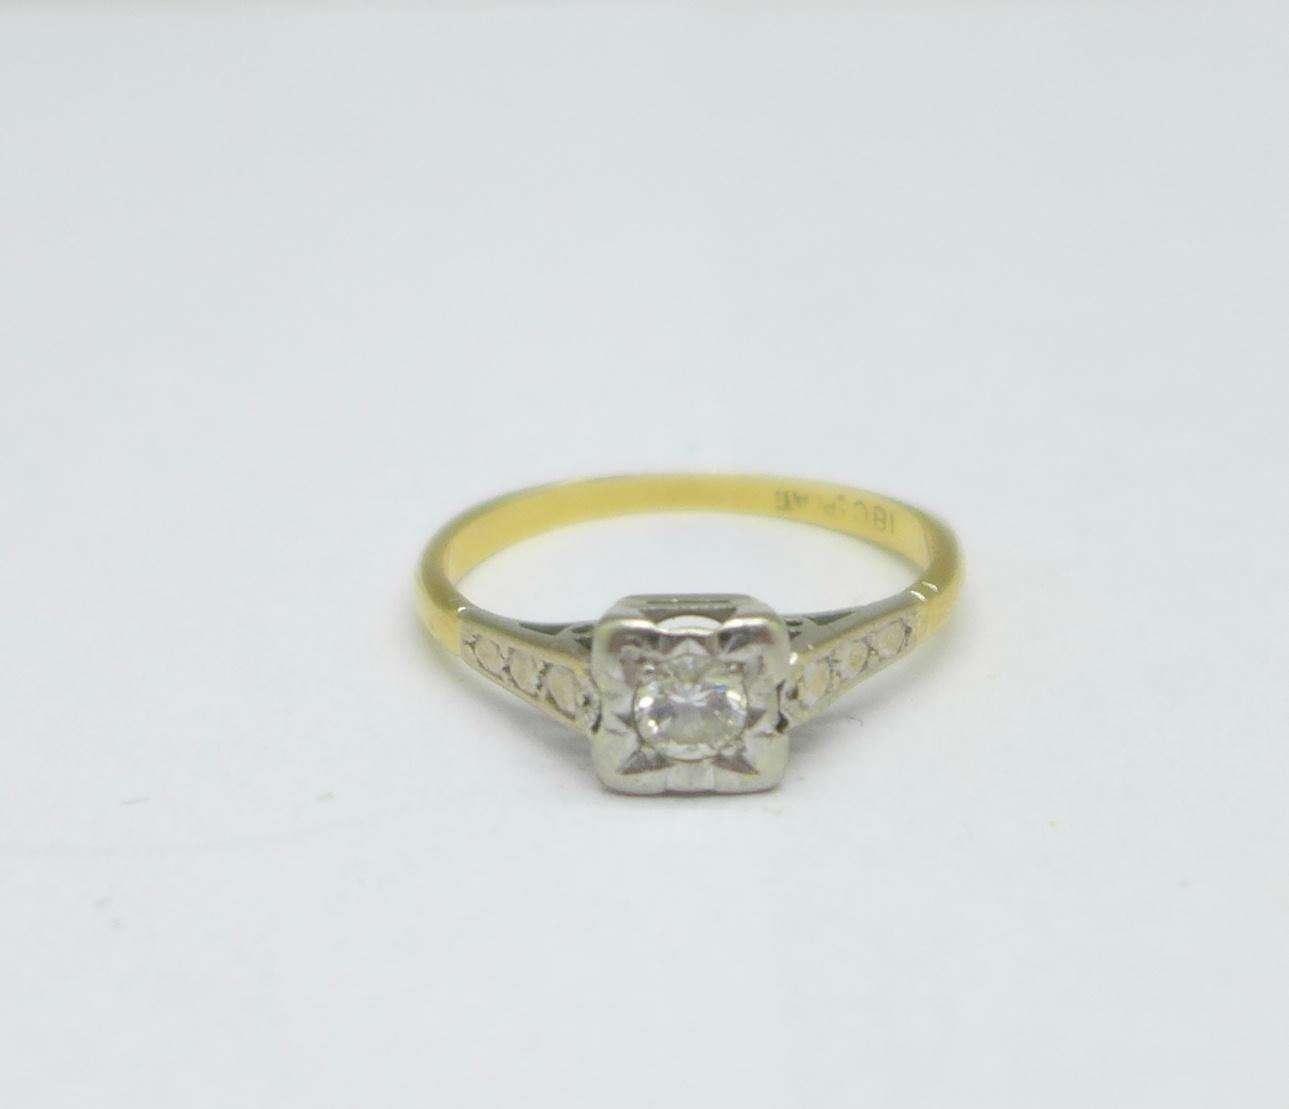 An 18ct gold and platinum set diamond ring, 2.3g, L